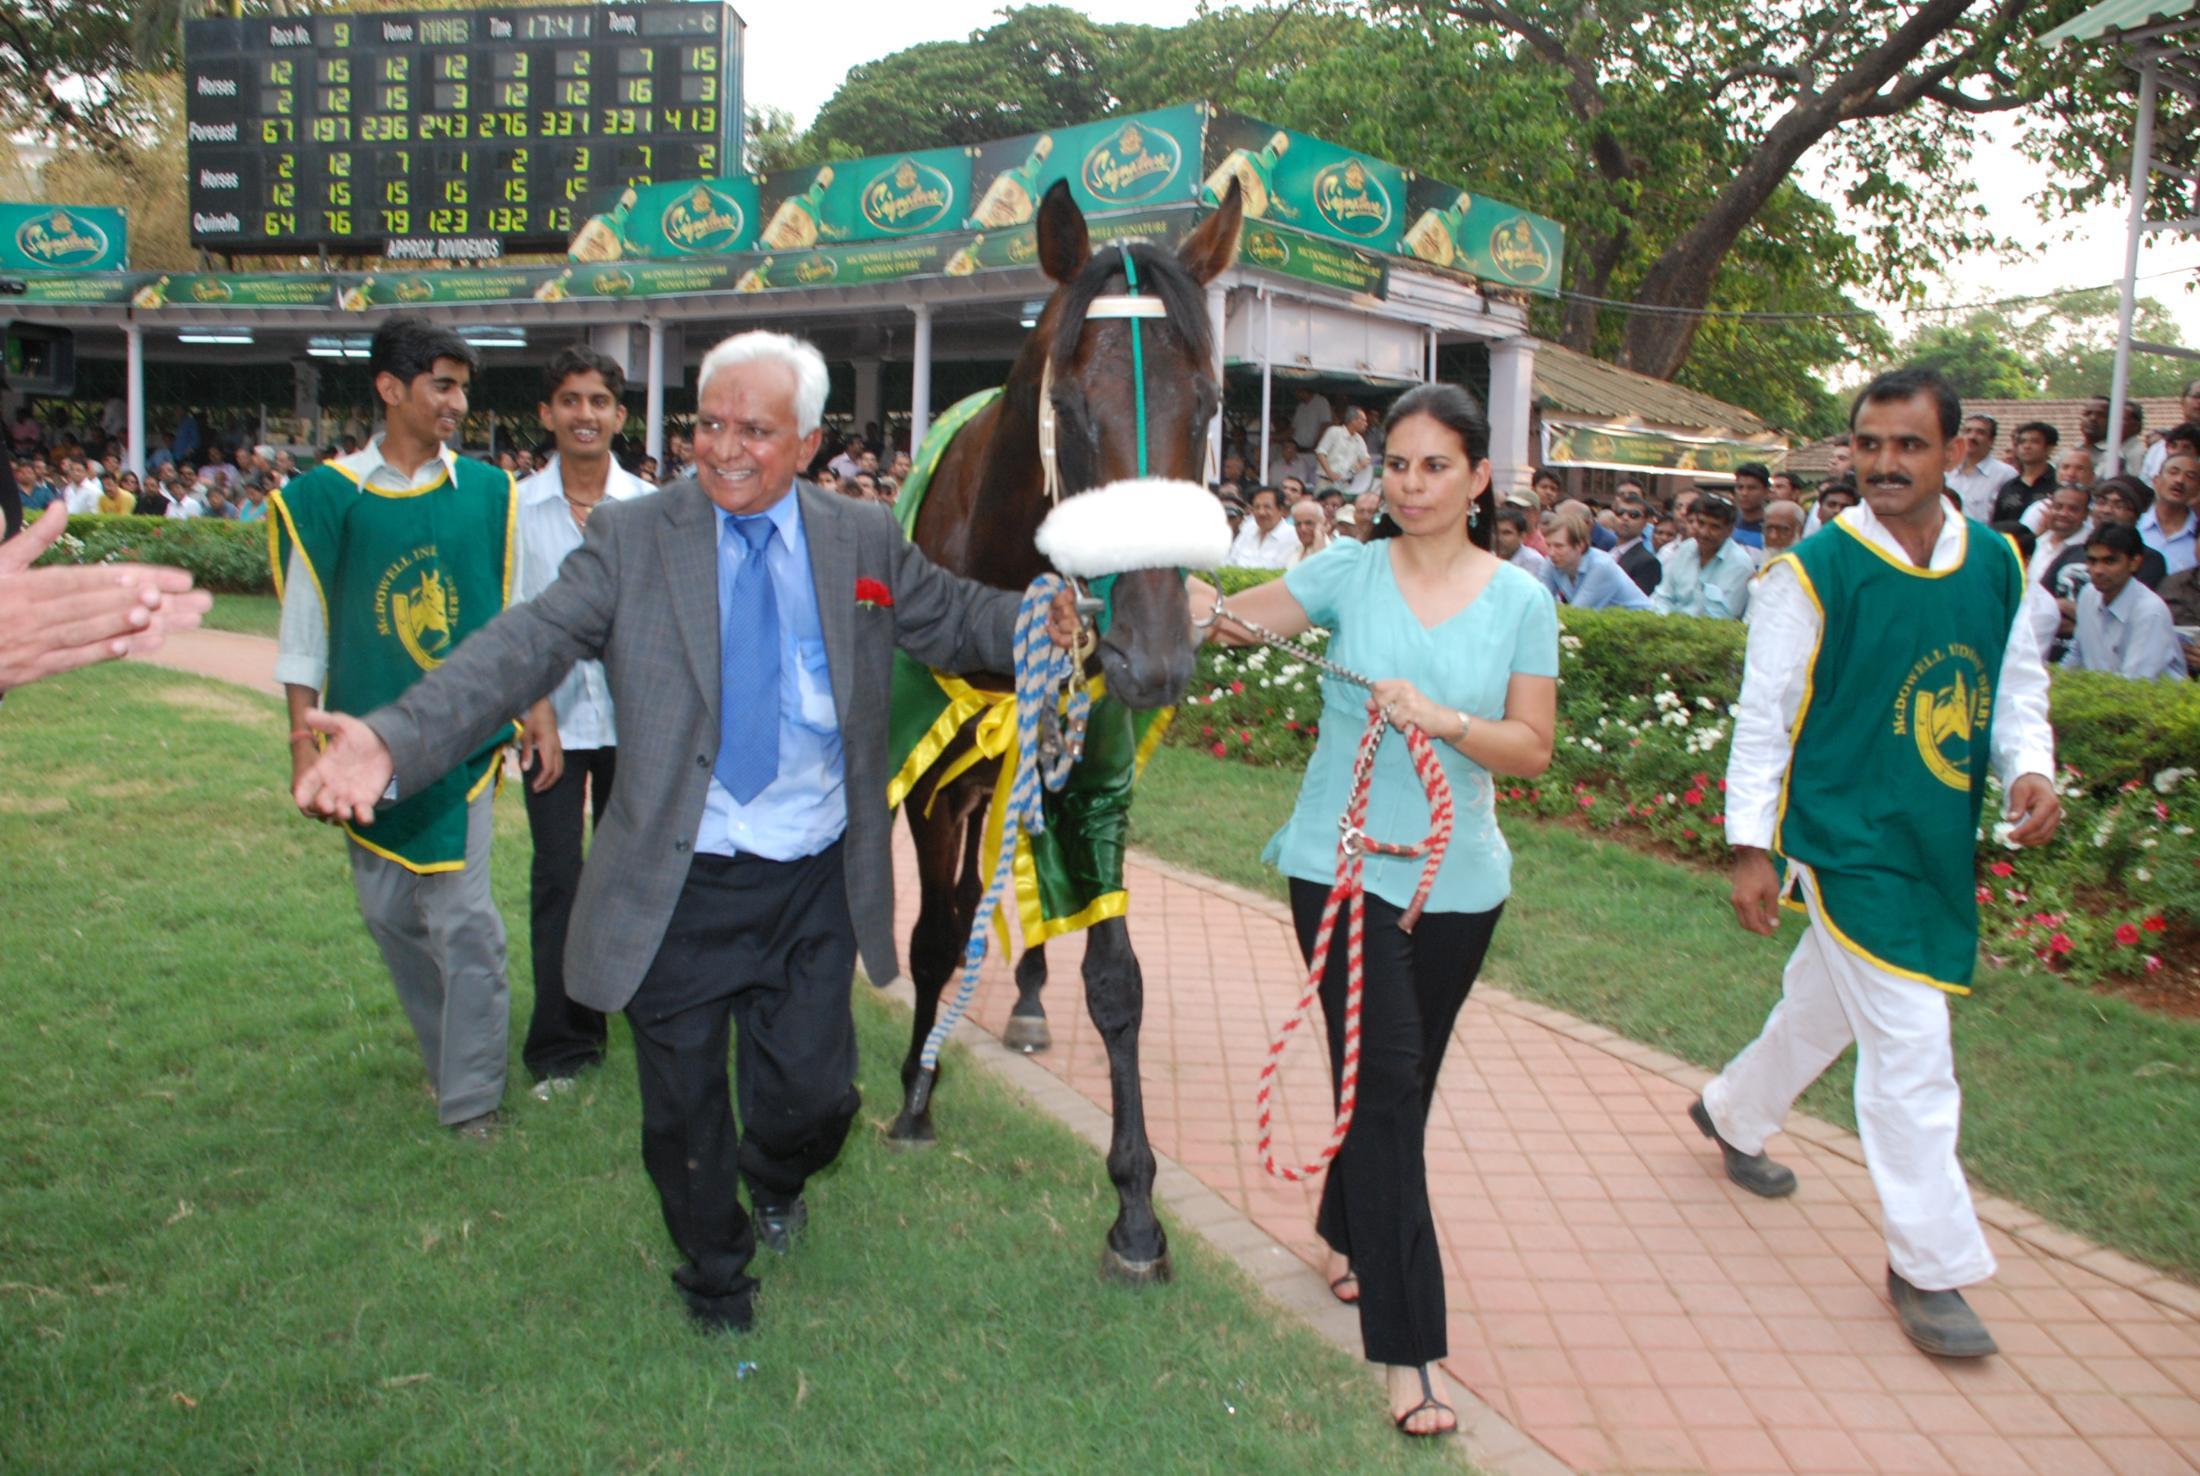 Antonios with trainer S.S. Shah